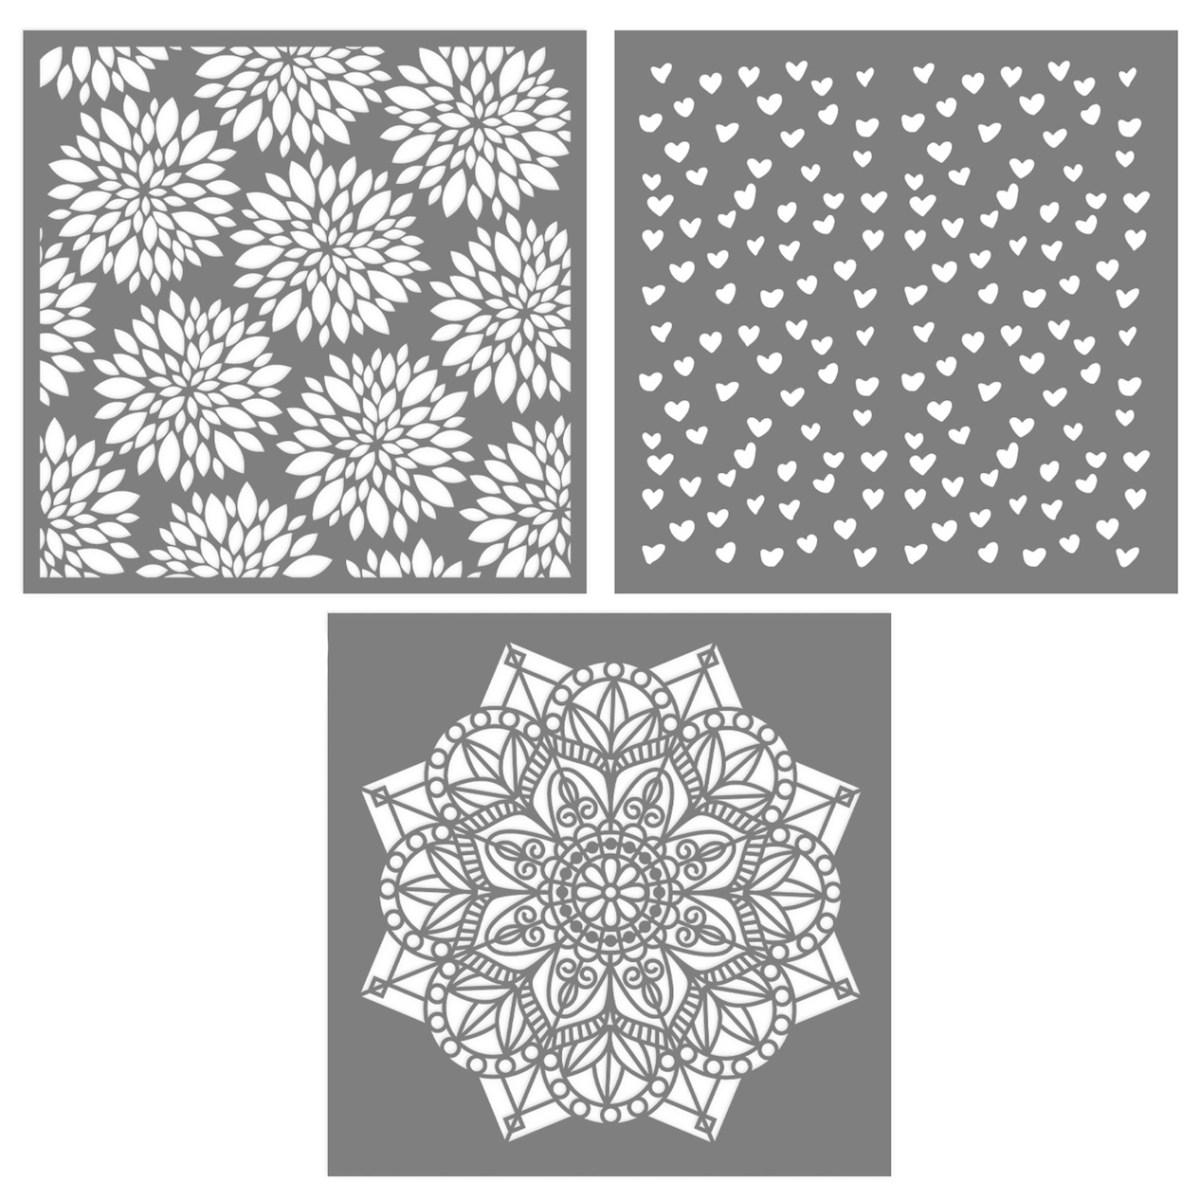 CTMH Core Products #ctmh #closetomyheart #papercrafting #scrapbooking #cardmaking #mixedmedia #diy #maker #stencils